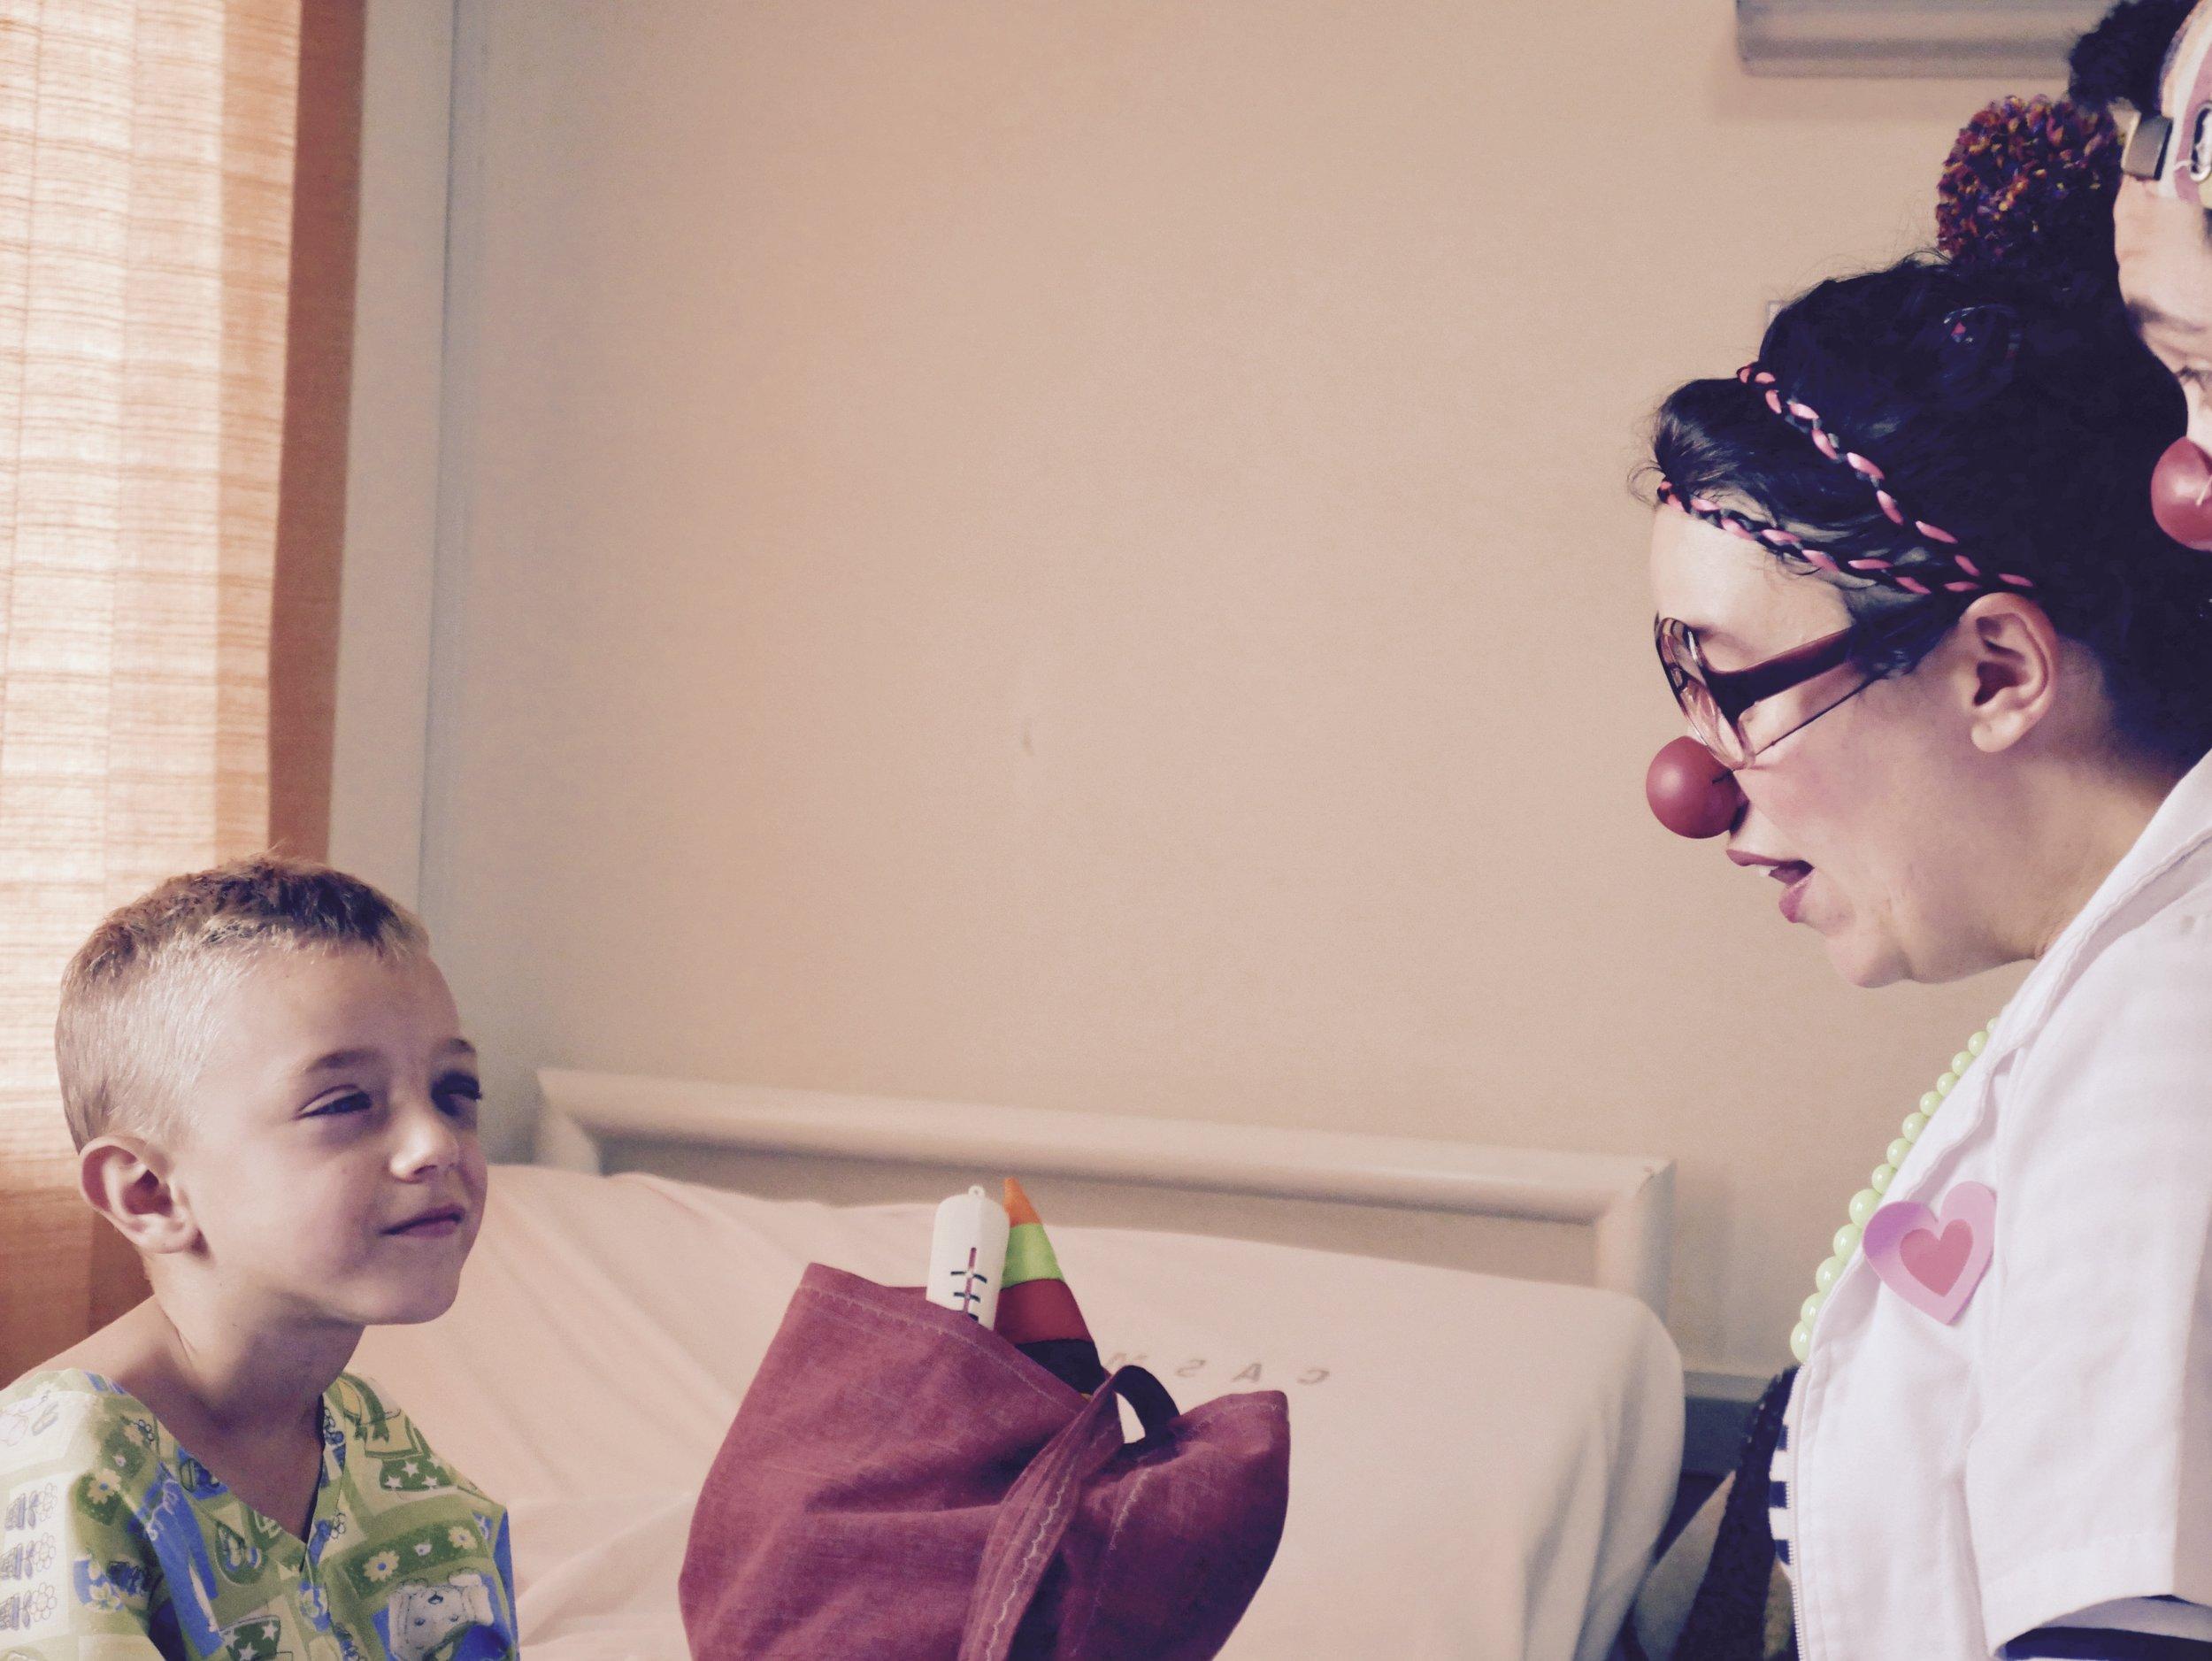 Clowns offering smiles in a hospital / Fundation SALUDARTE